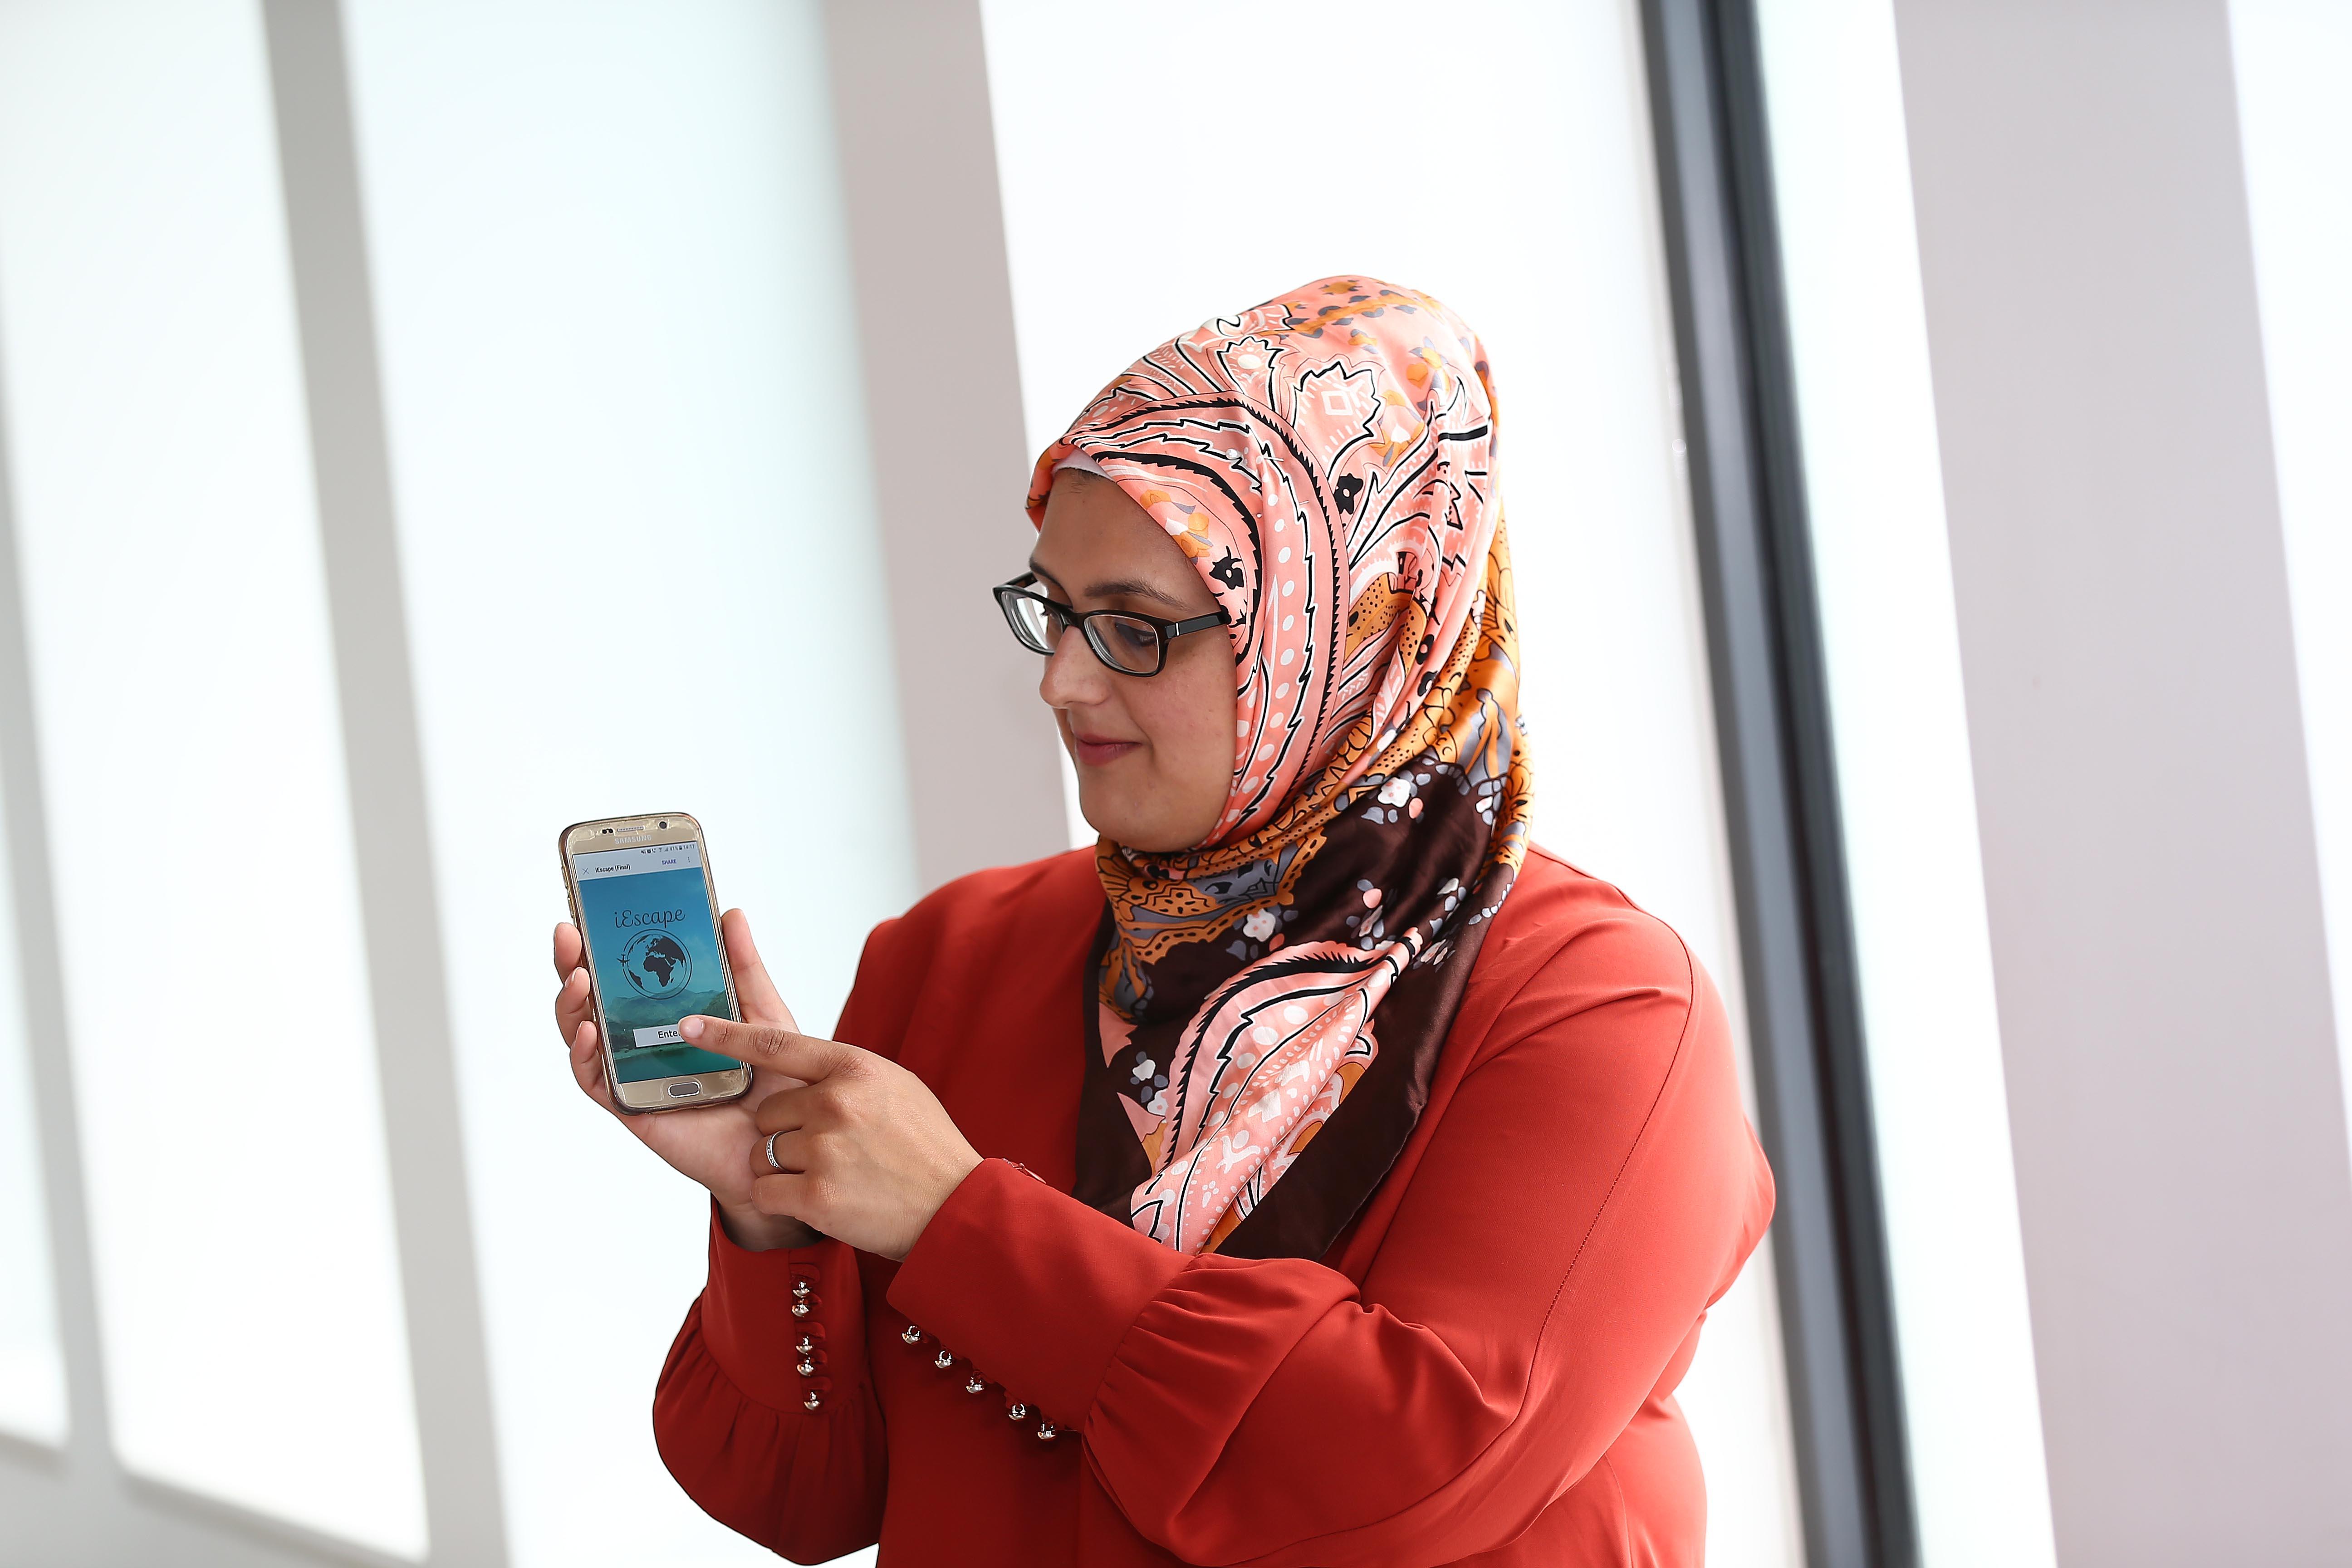 Zahra Rahman at the computing degree show